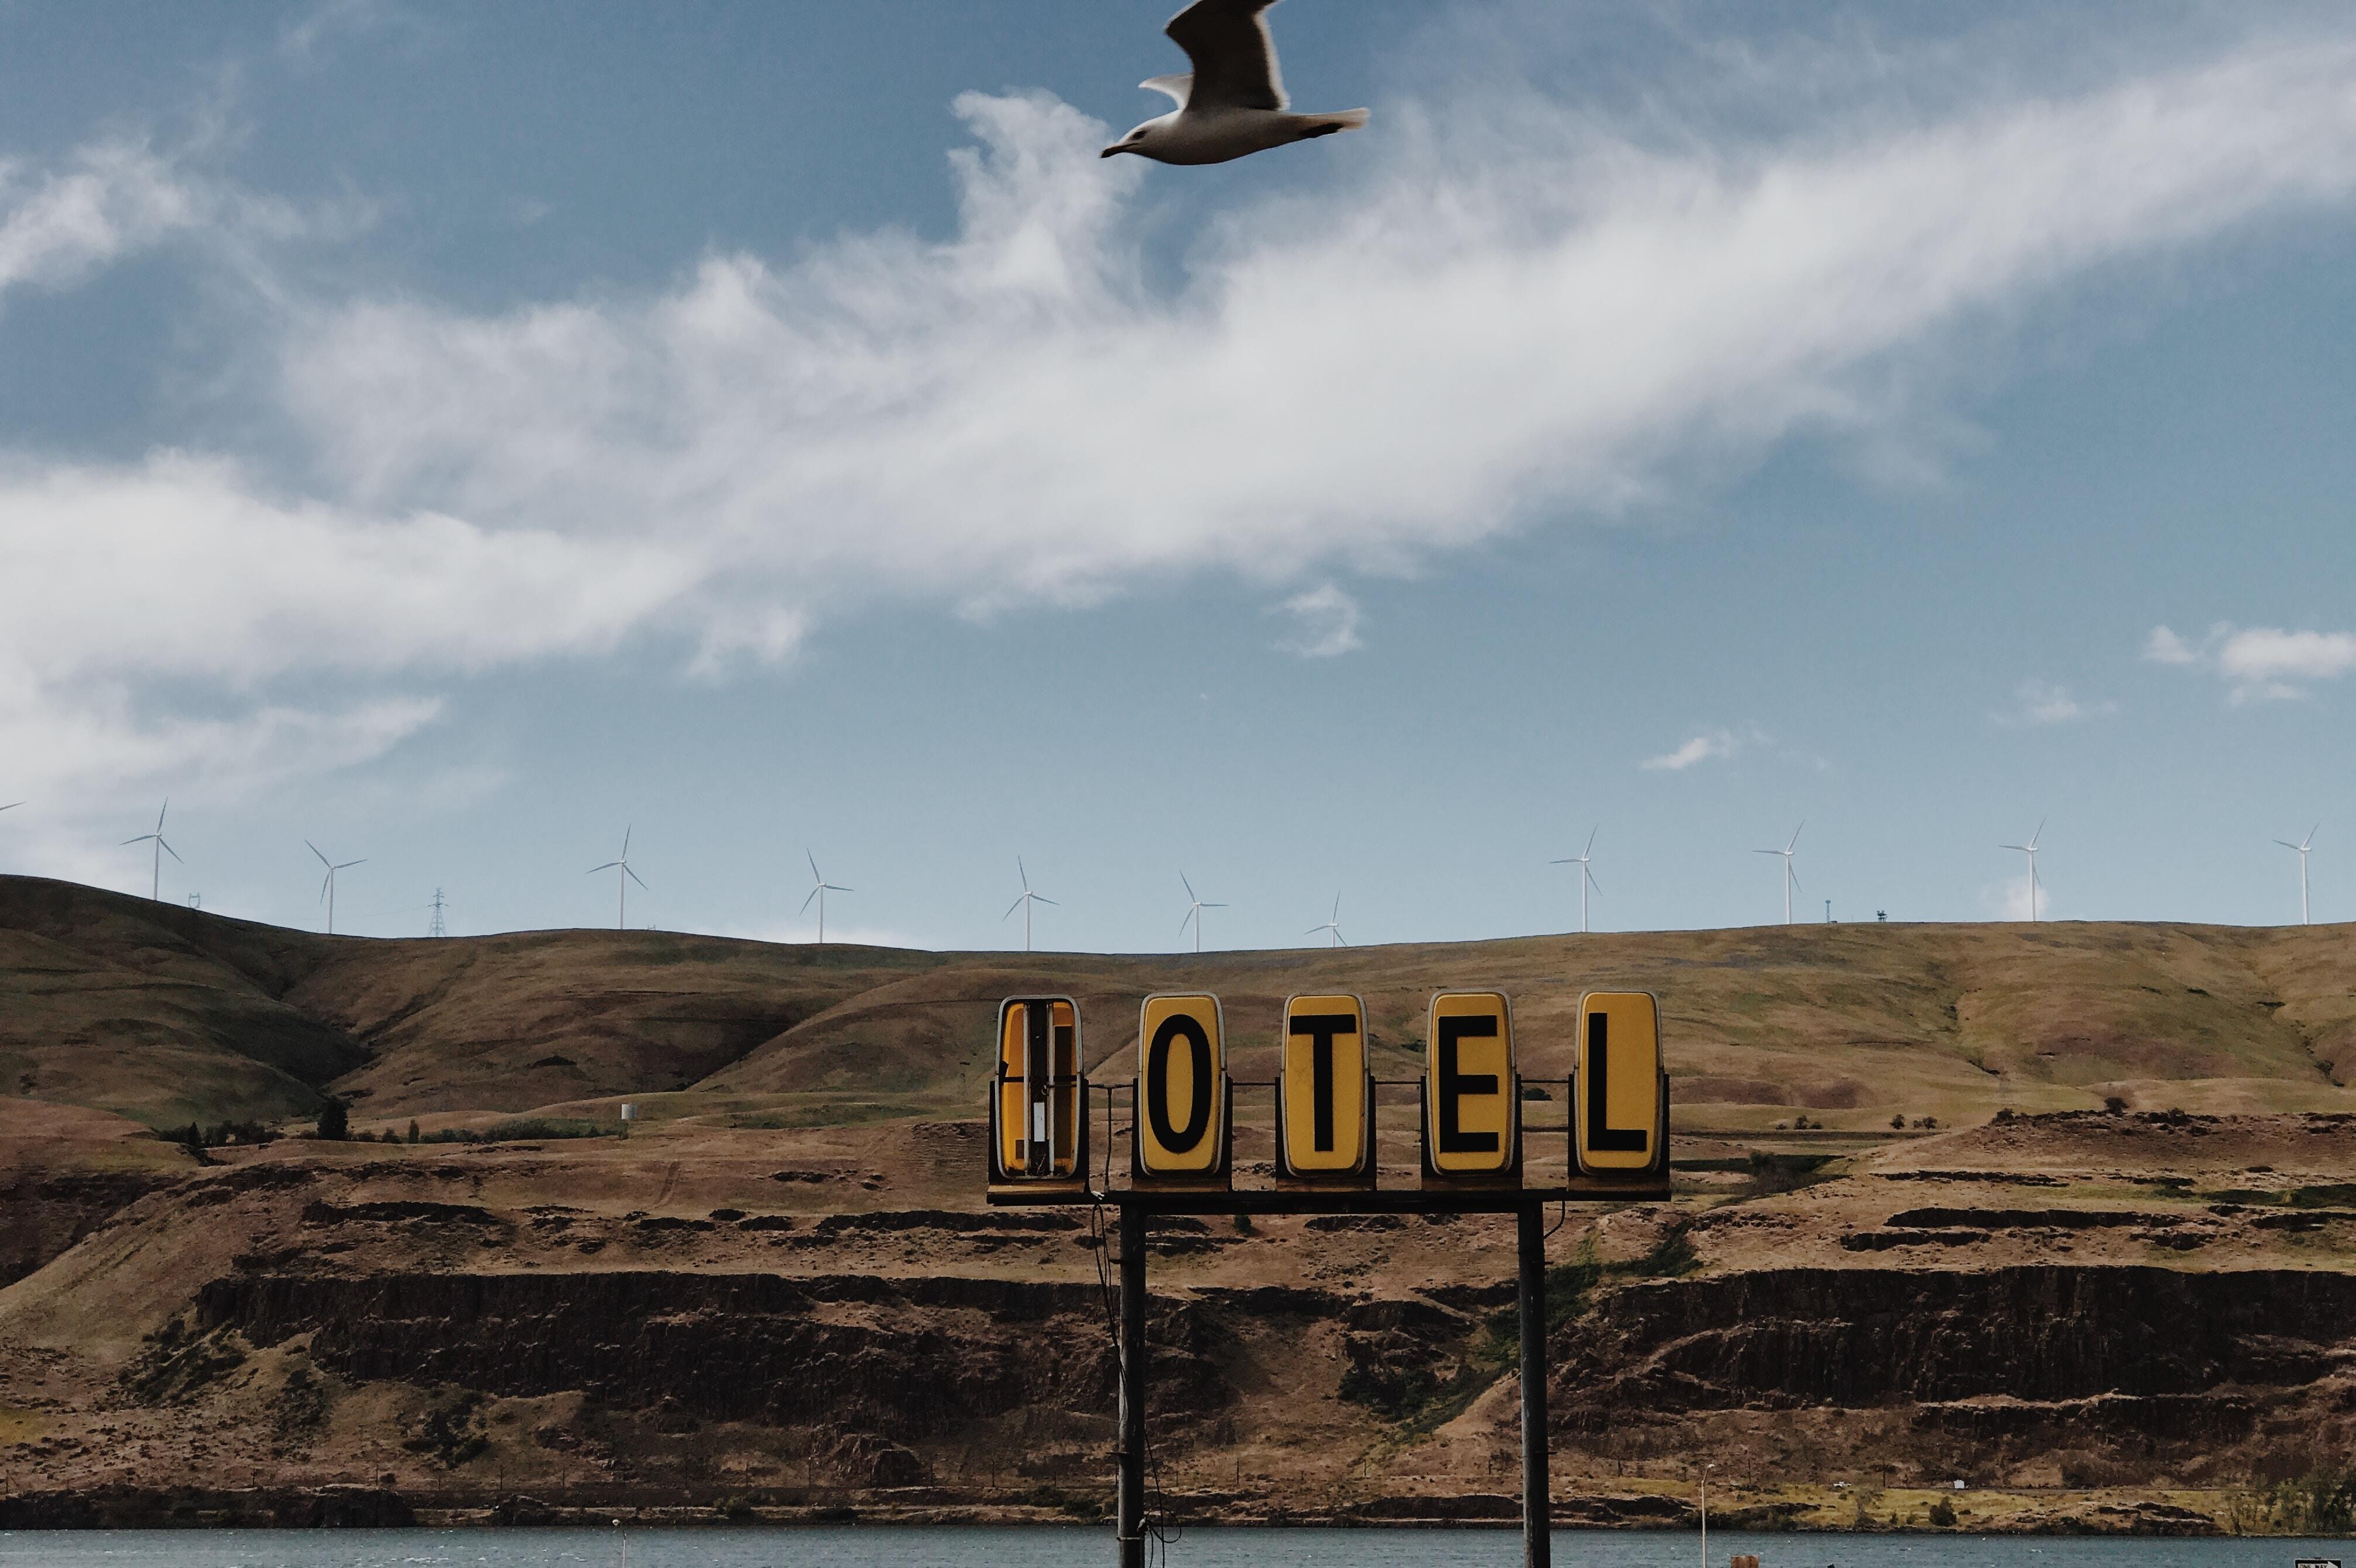 gull flying above motel signage